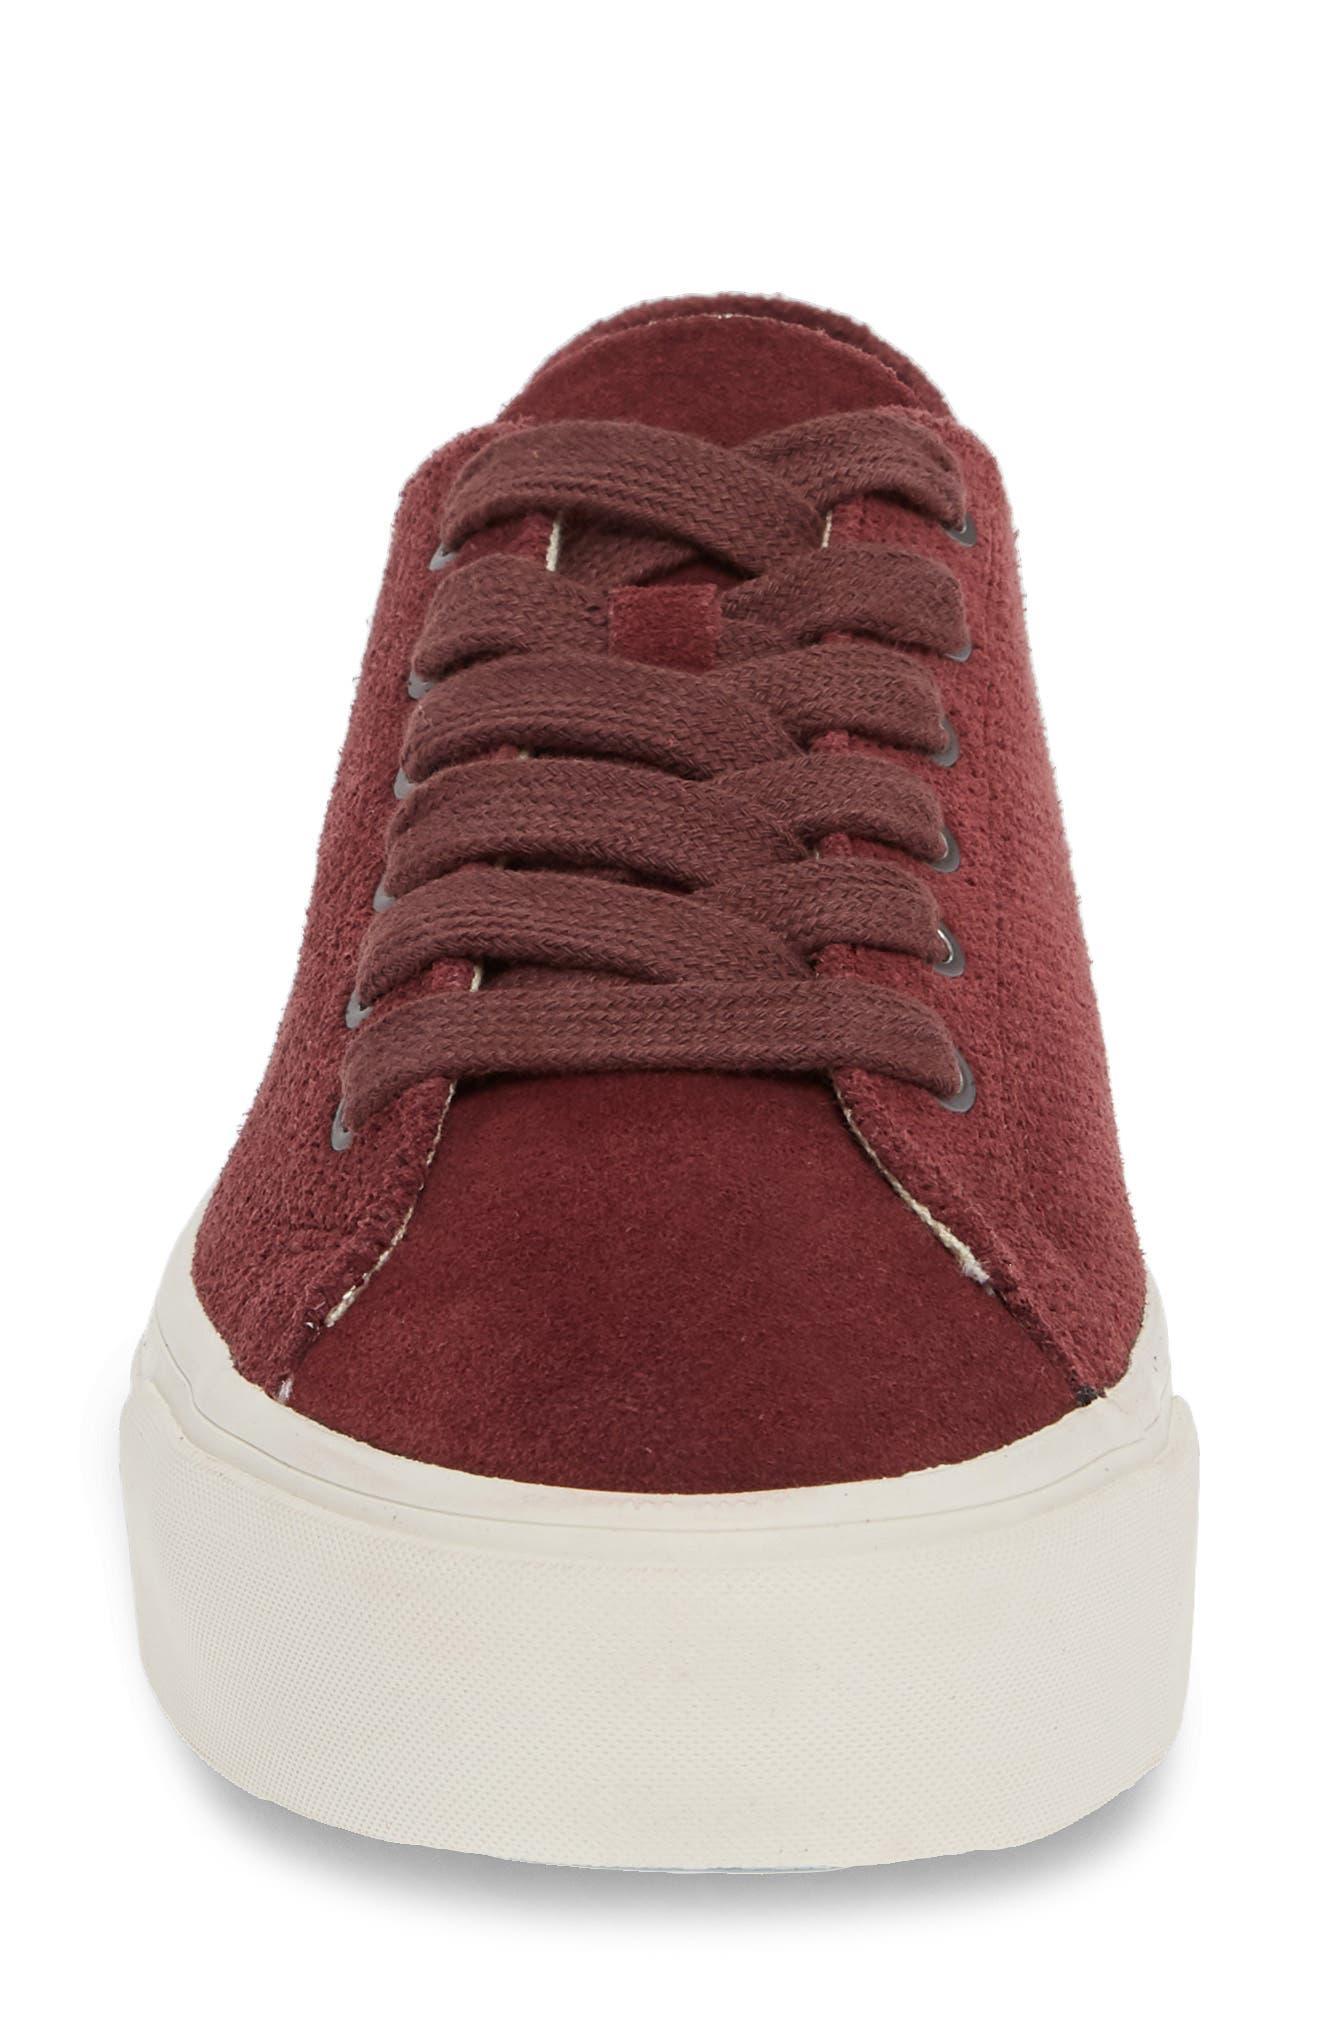 Sausalito Sneaker,                             Alternate thumbnail 4, color,                             WINE